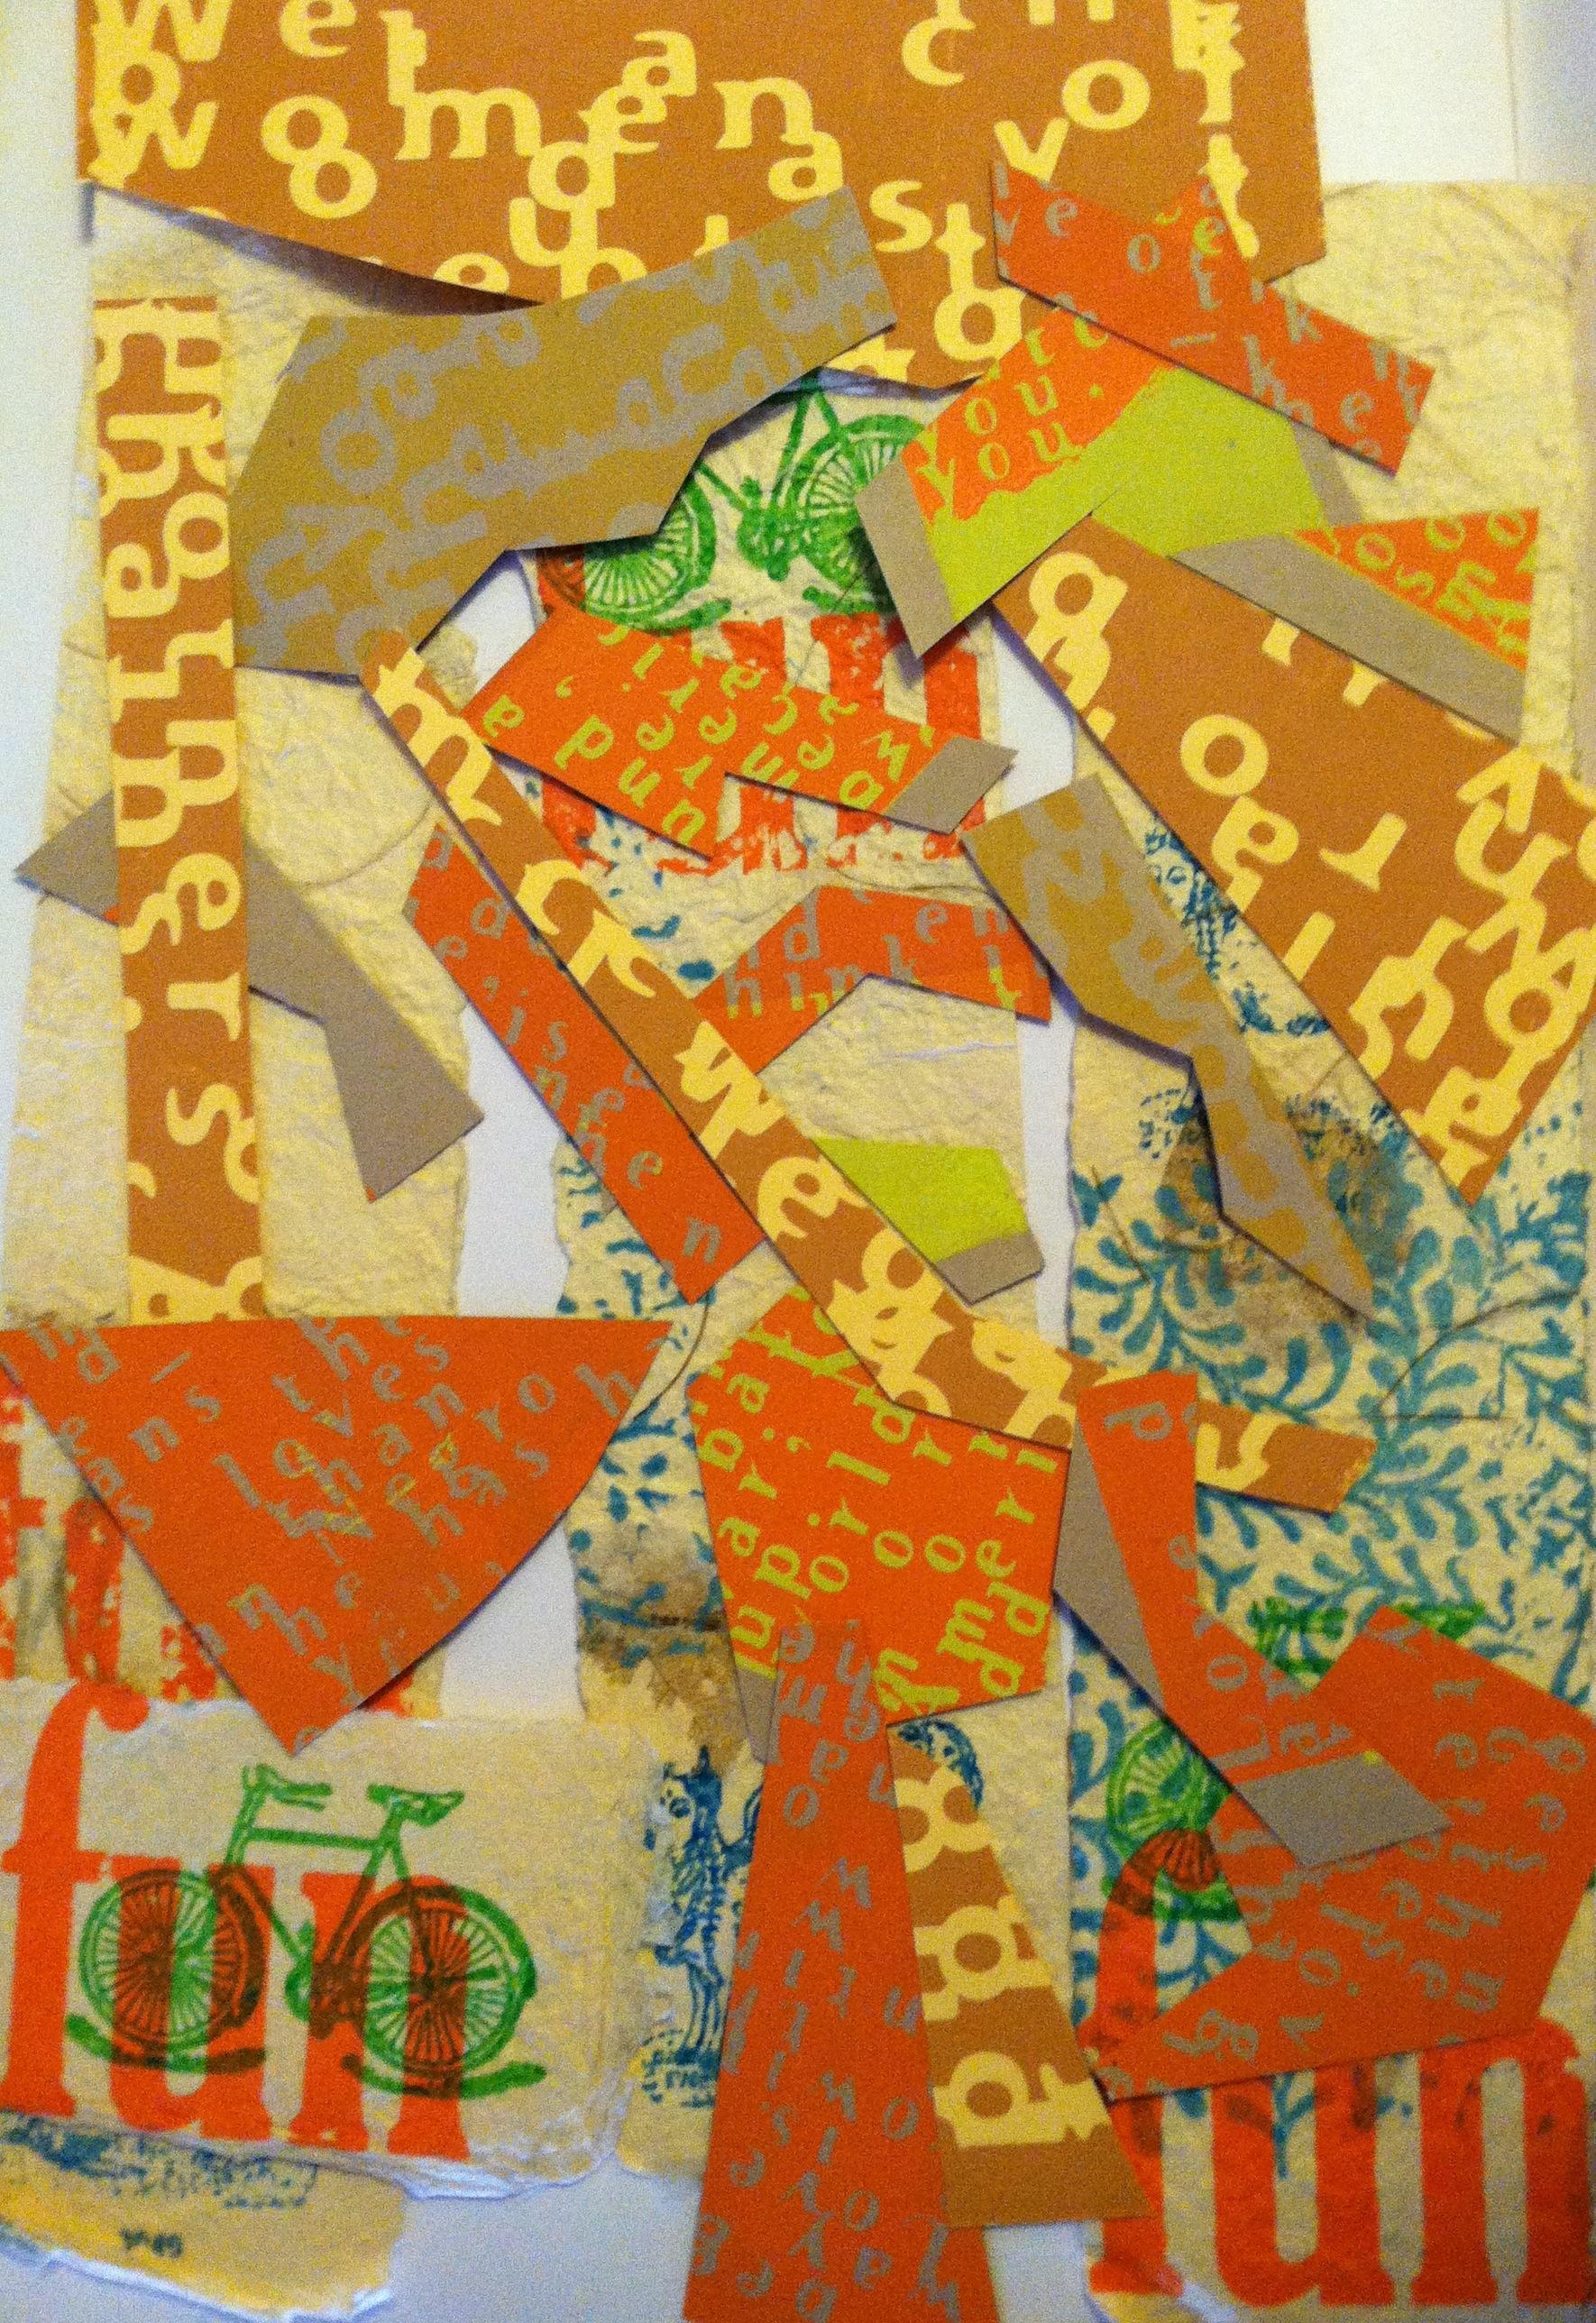 Salvador de Bahia + more  - image 2 - student project